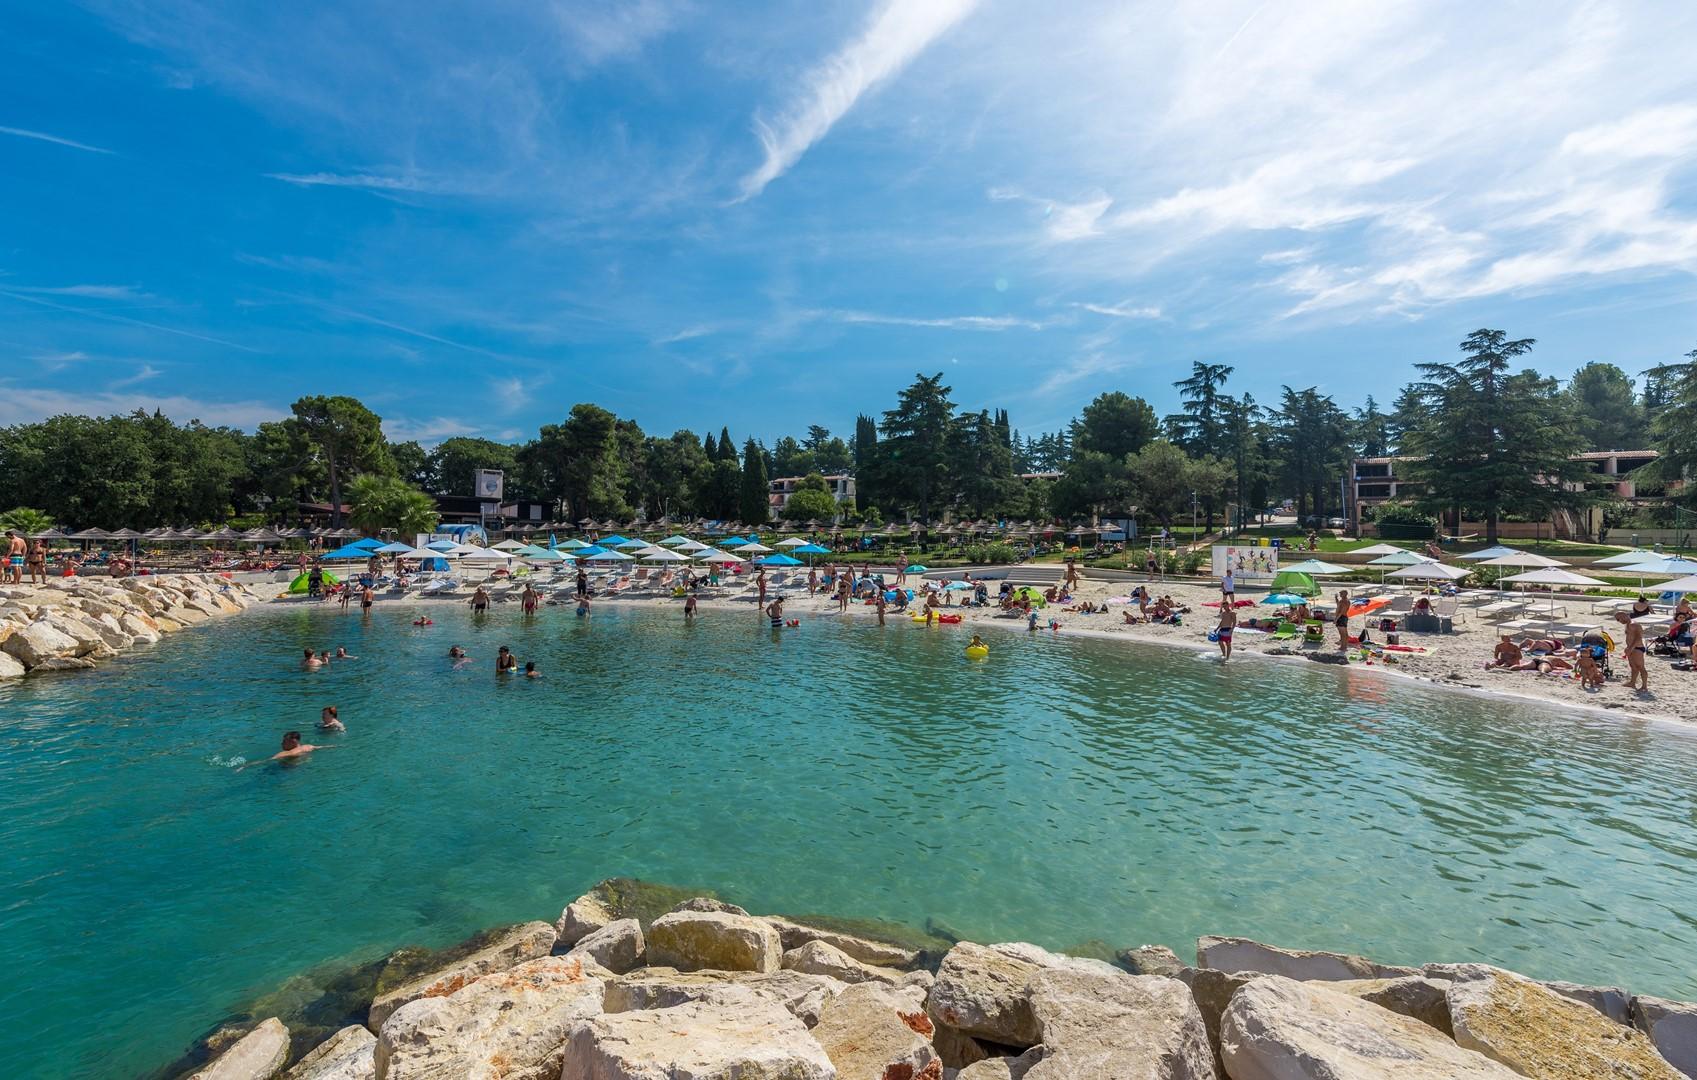 Ferienhaus Villa Albina mit privatem Pool in der Nähe von Aquacolors (2240246), Mugeba, , Istrien, Kroatien, Bild 26